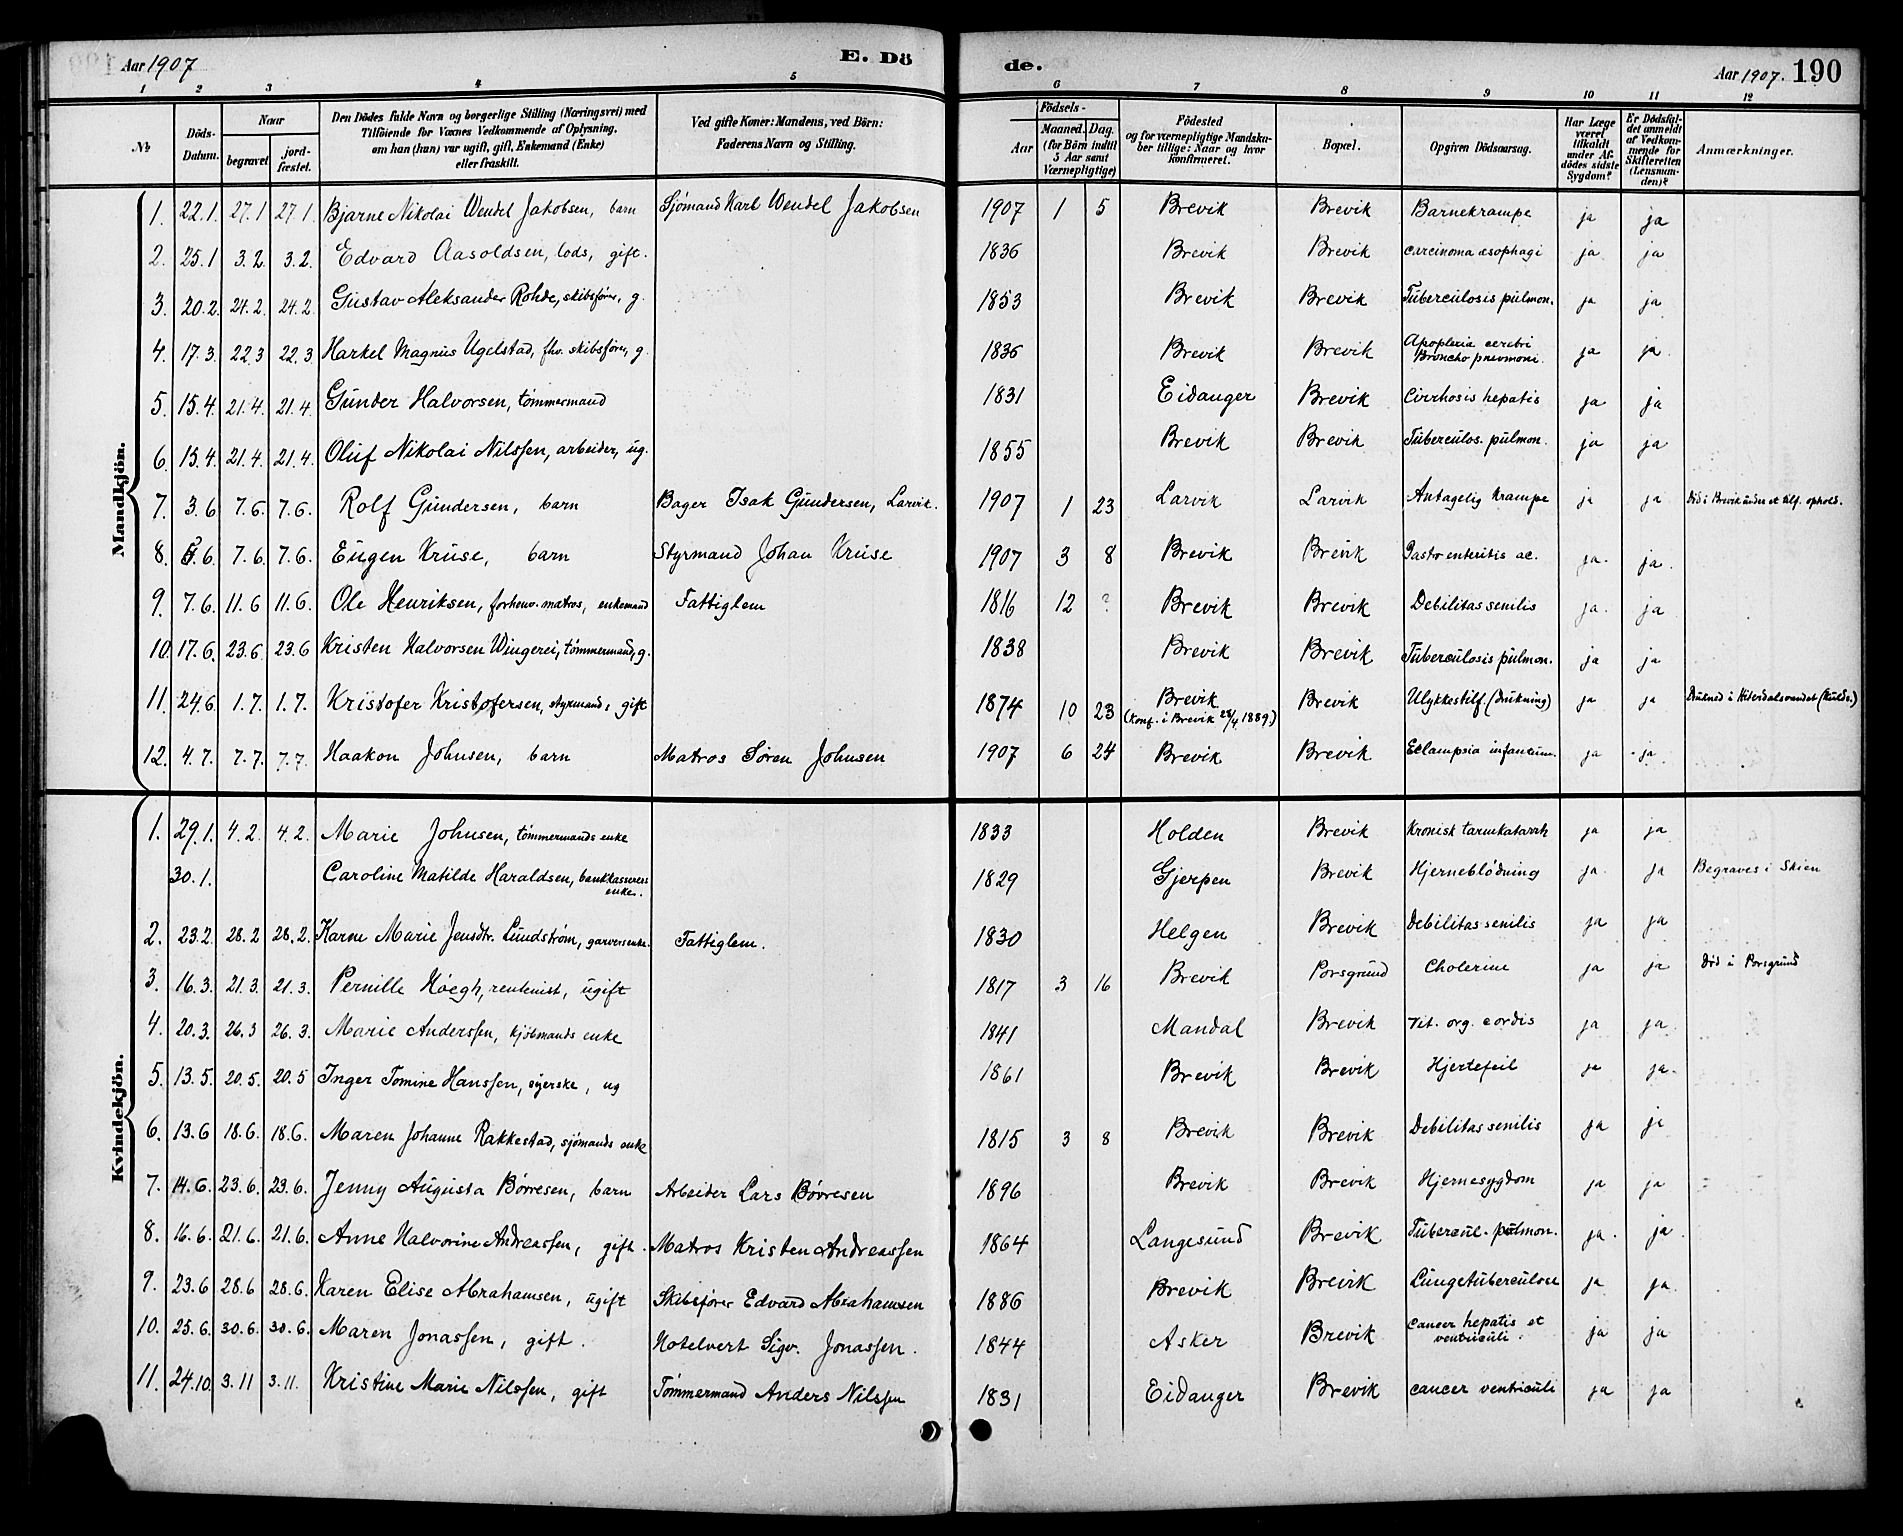 SAKO, Brevik kirkebøker, G/Ga/L0005: Klokkerbok nr. 5, 1901-1924, s. 190